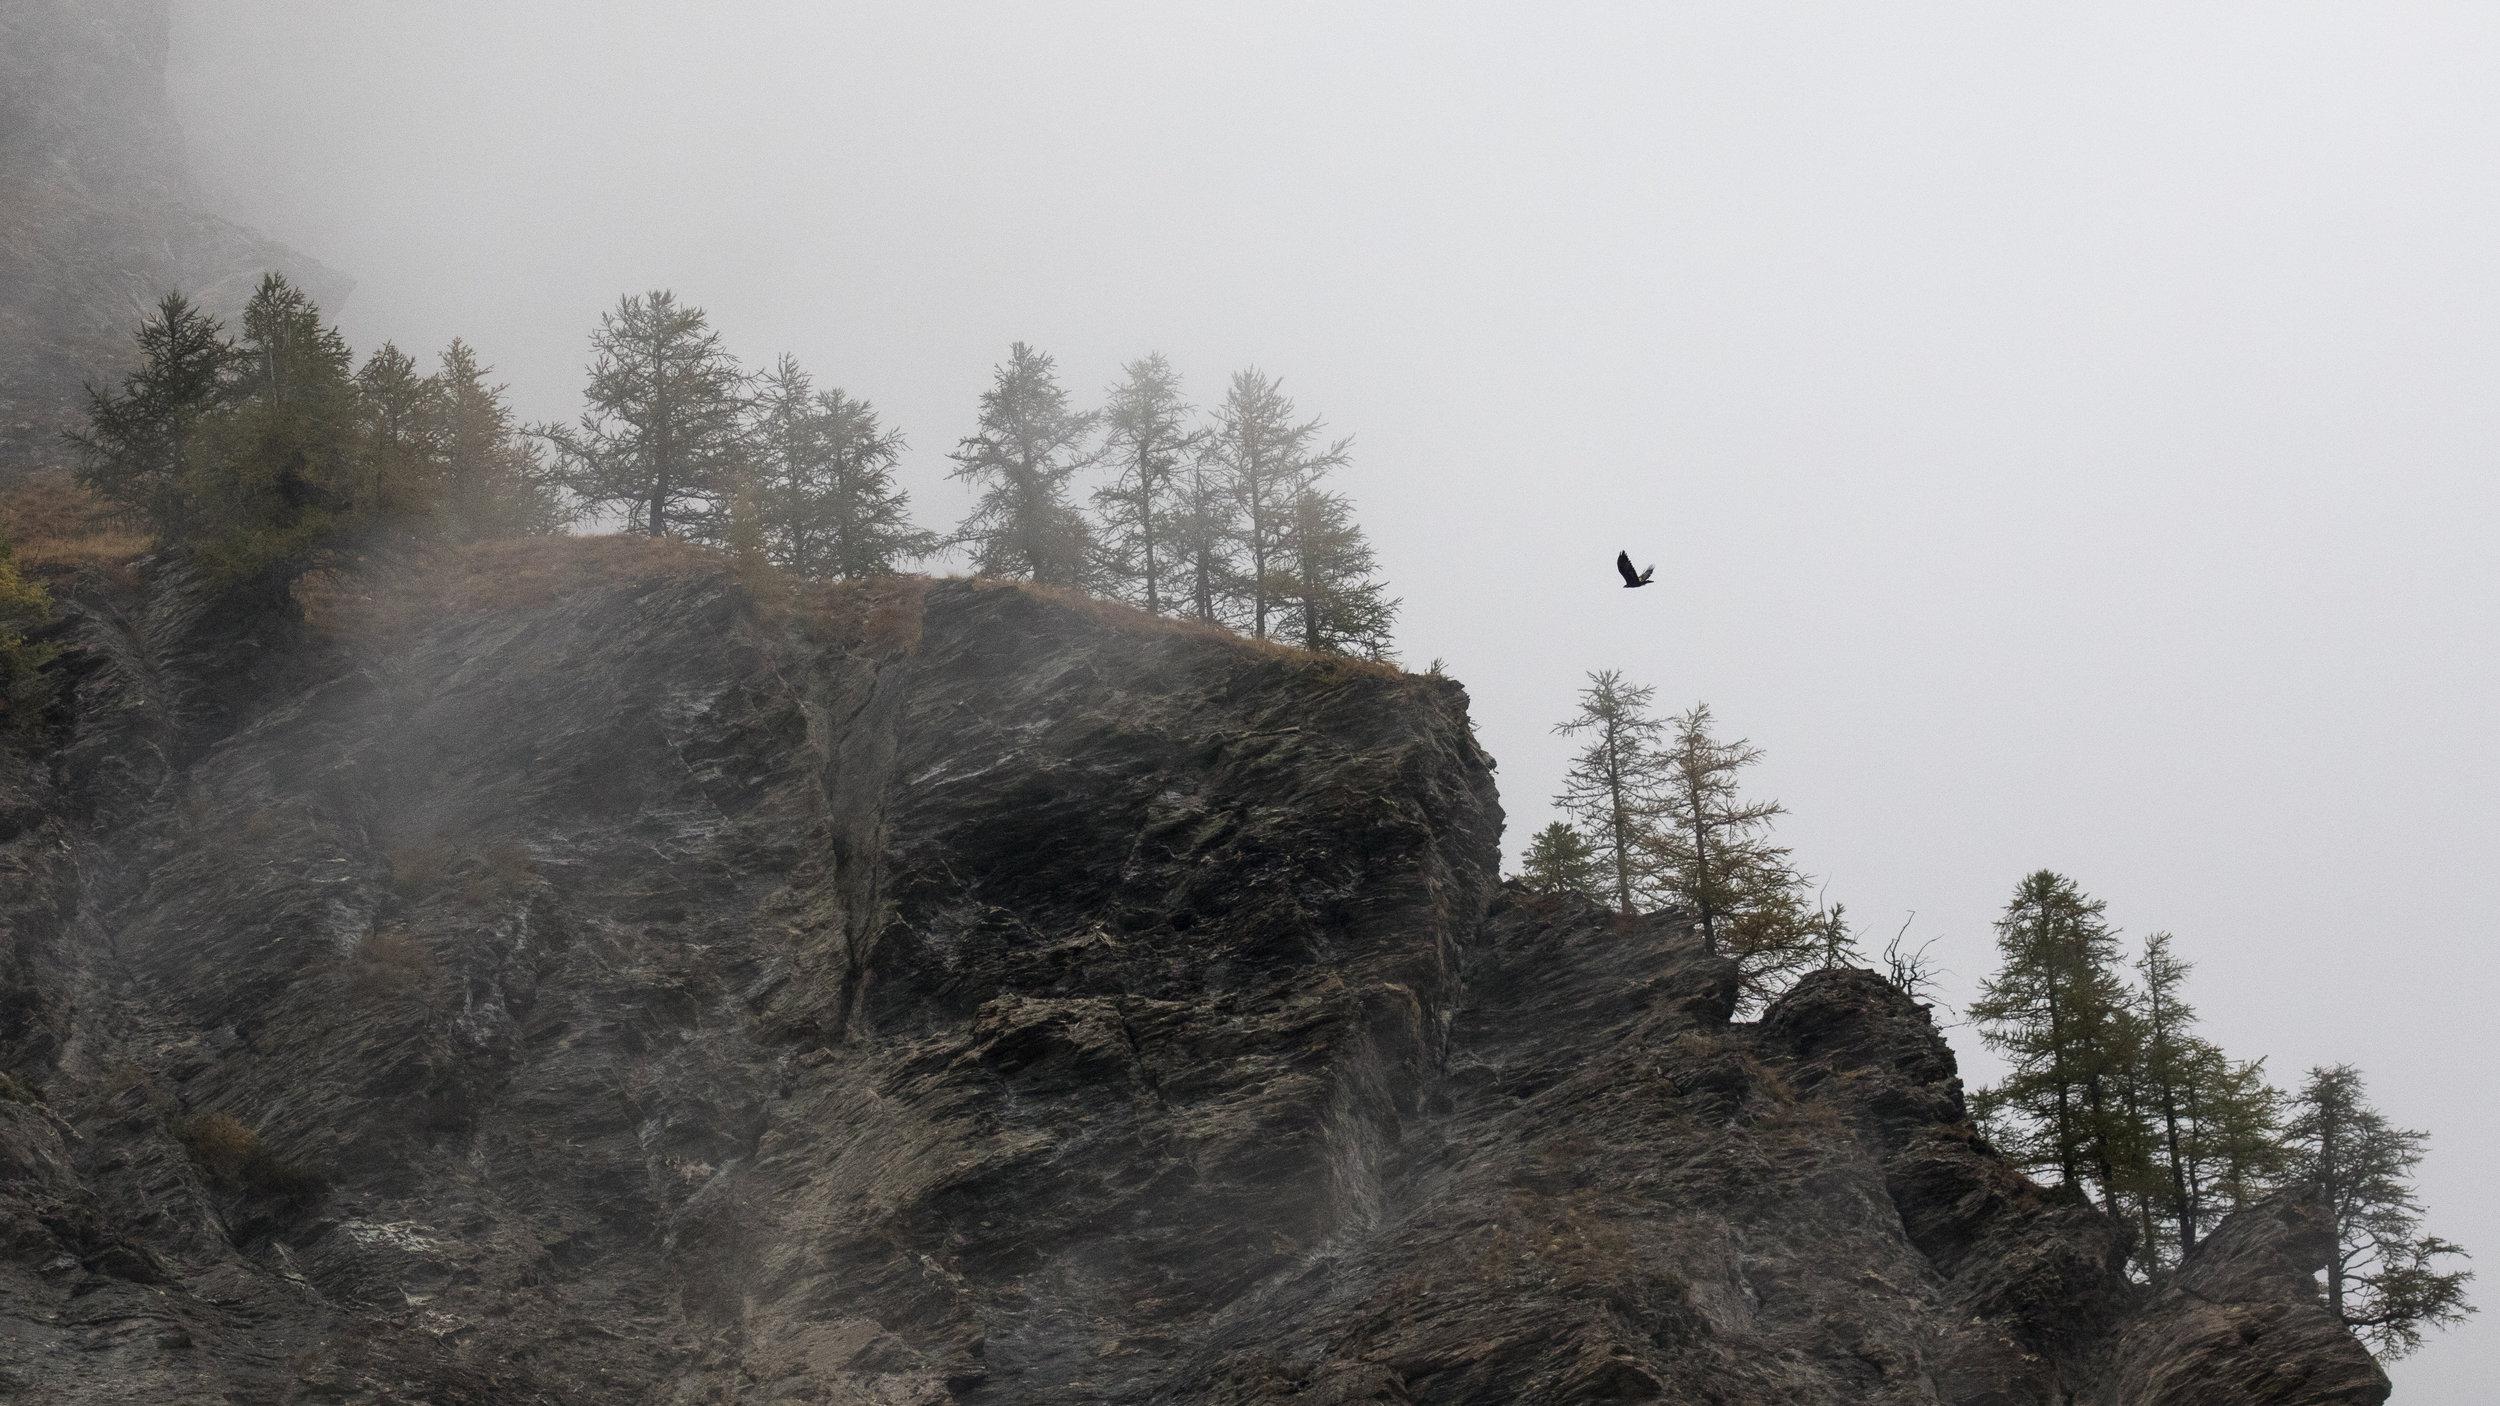 golden-eagle-salva-fauna